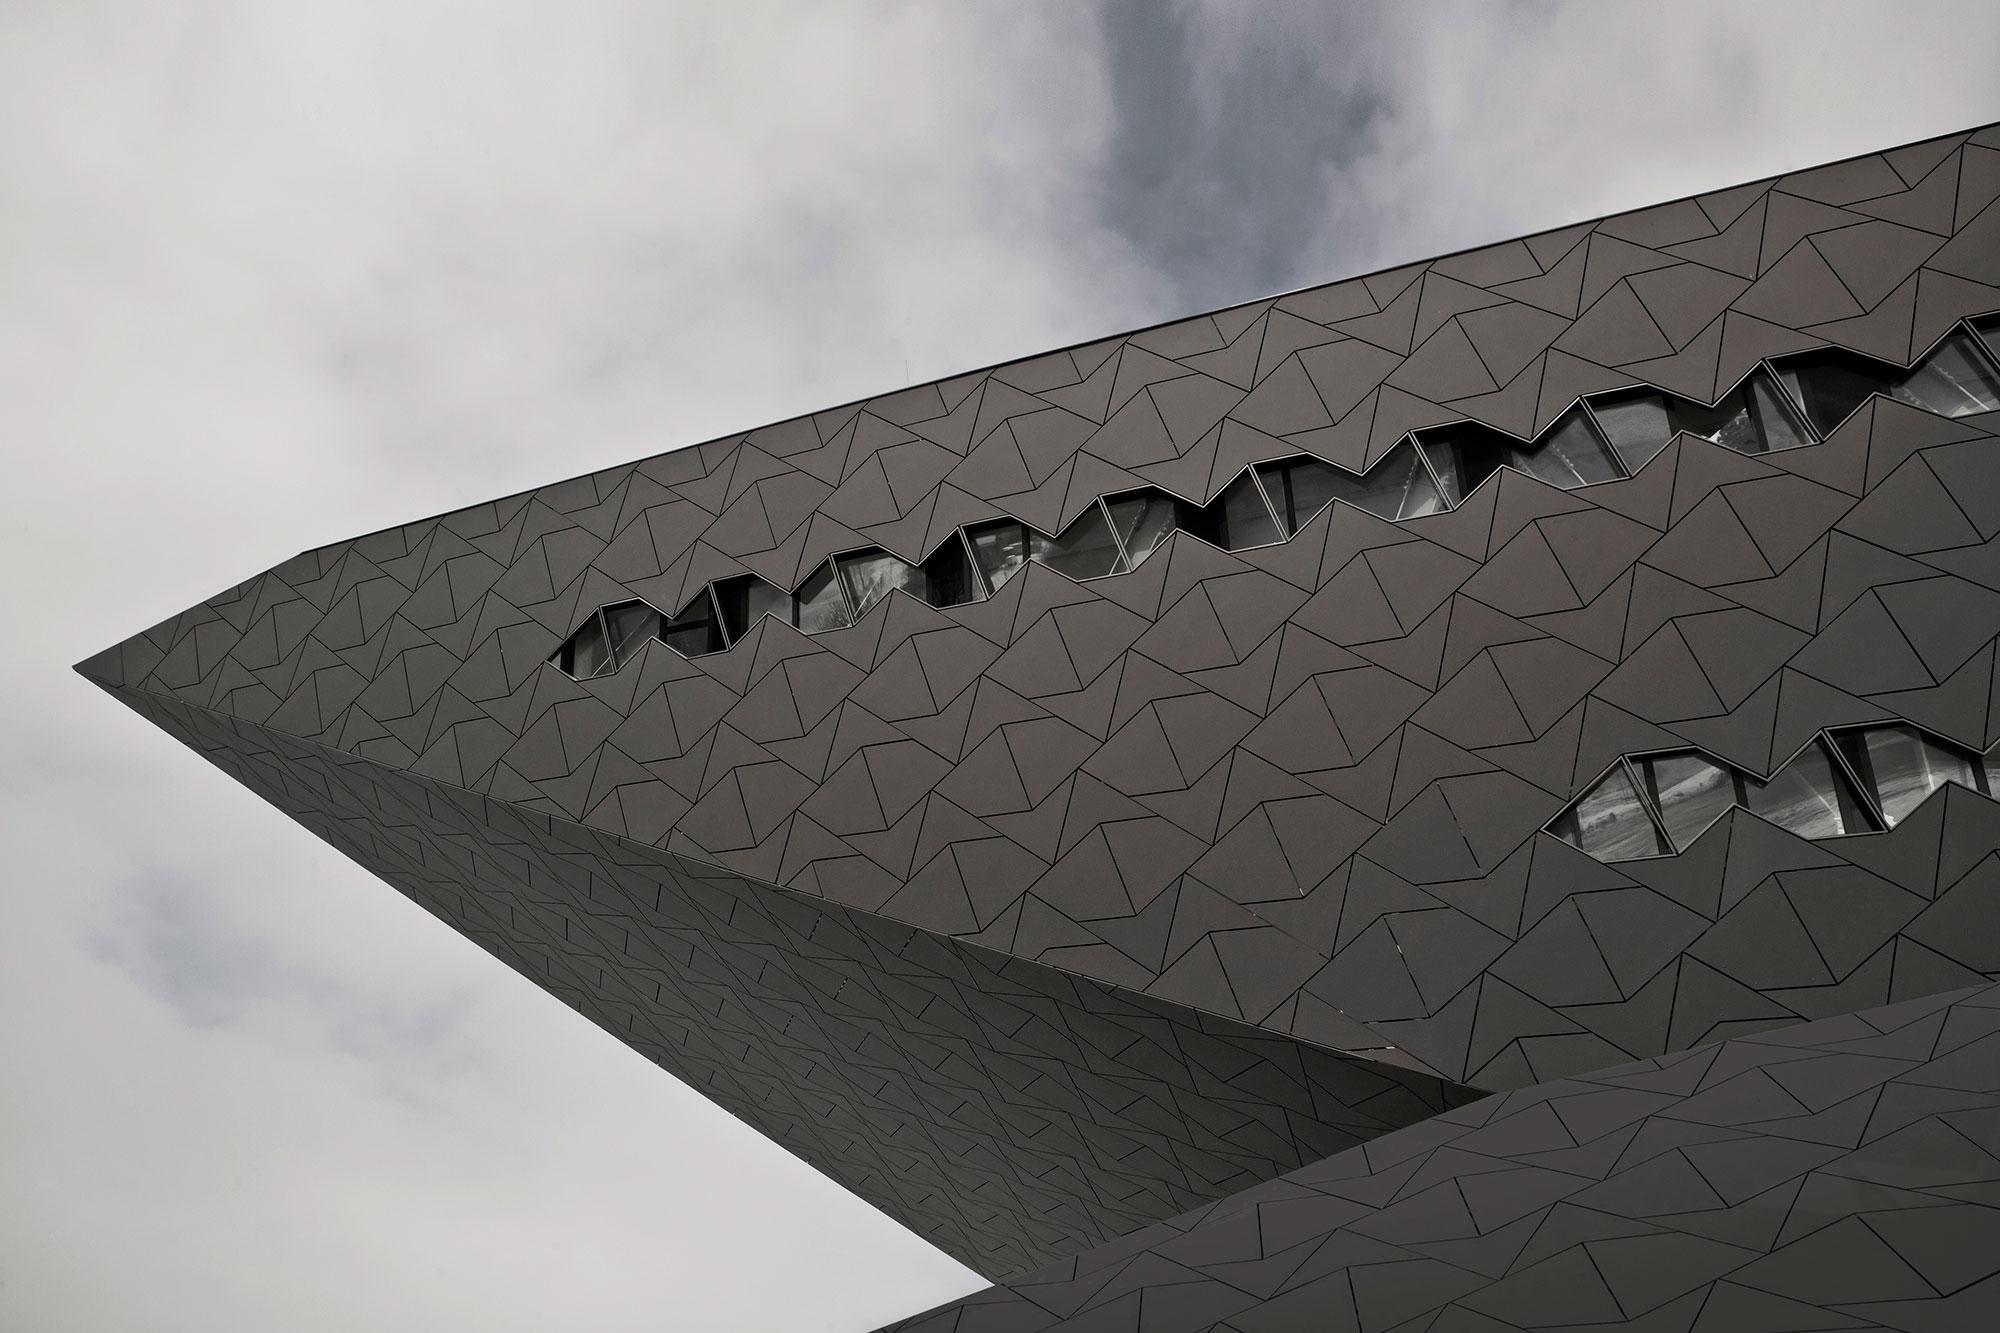 EQUITONE - hatschek fibre cement